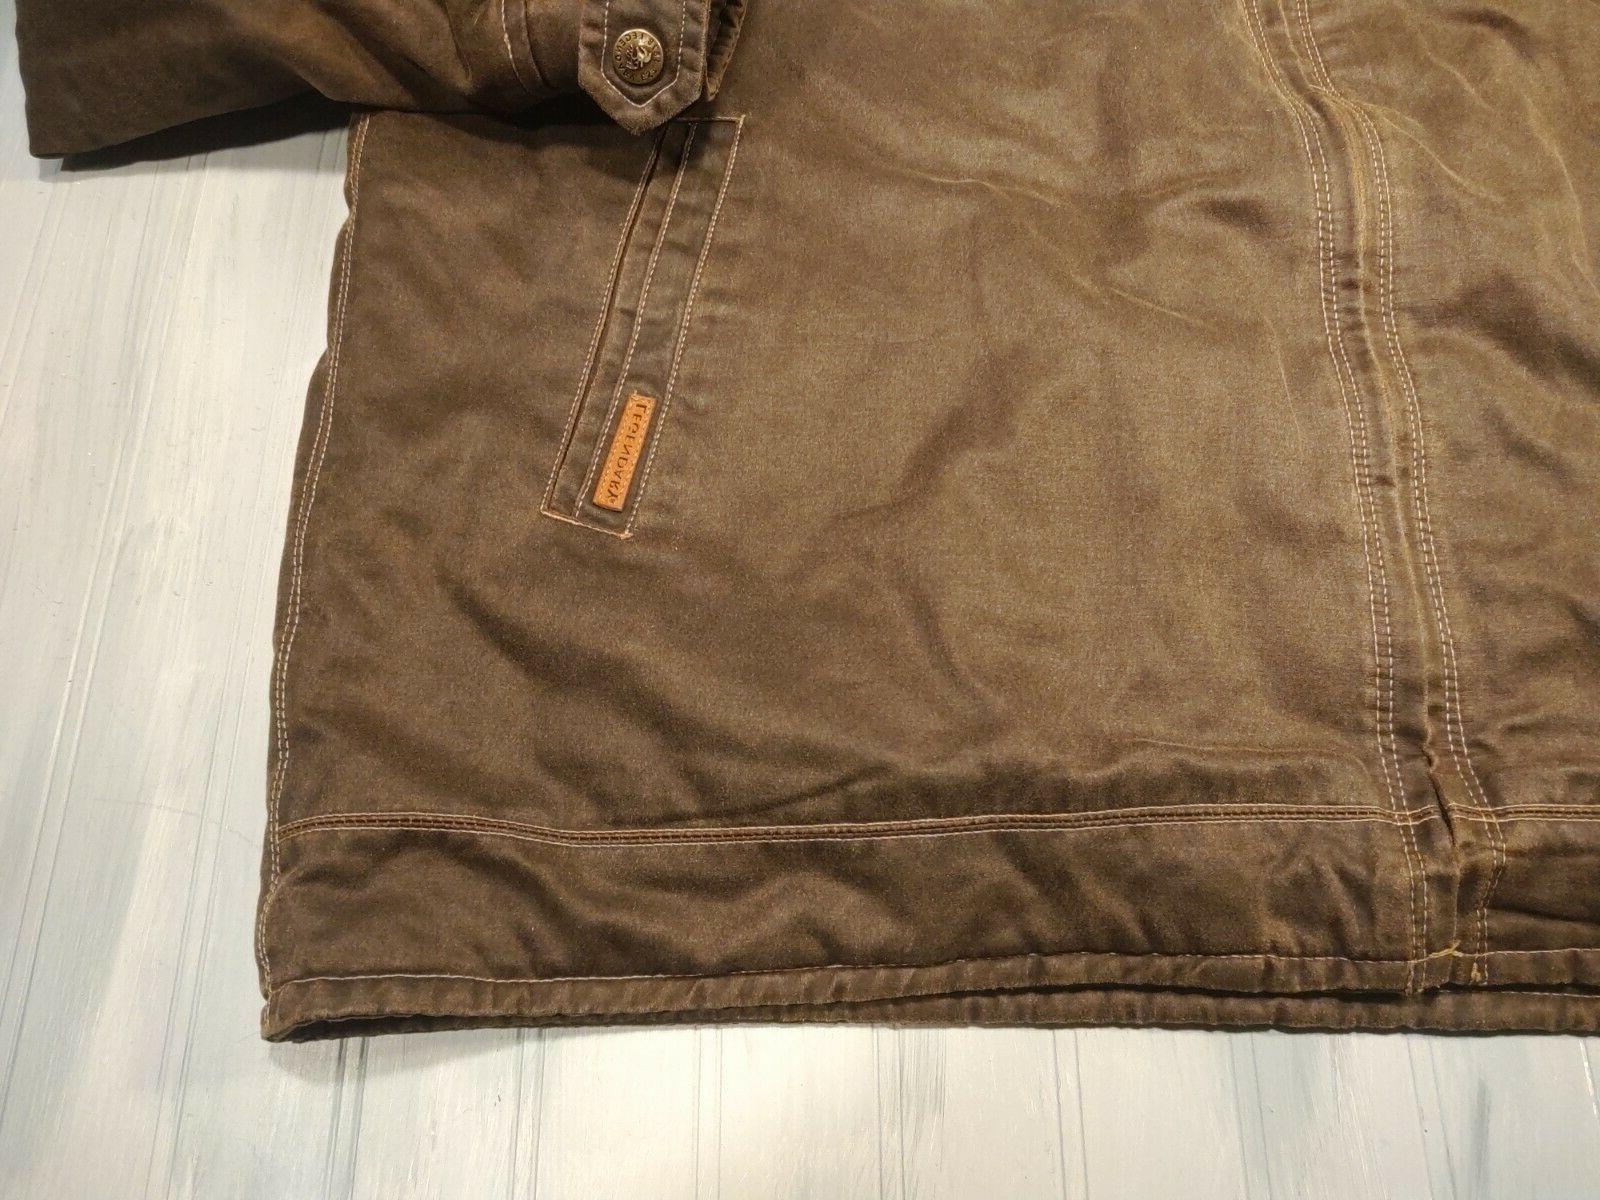 NWOT Legendary Whitetails 2xl Dakota Jacket B01K5U2700